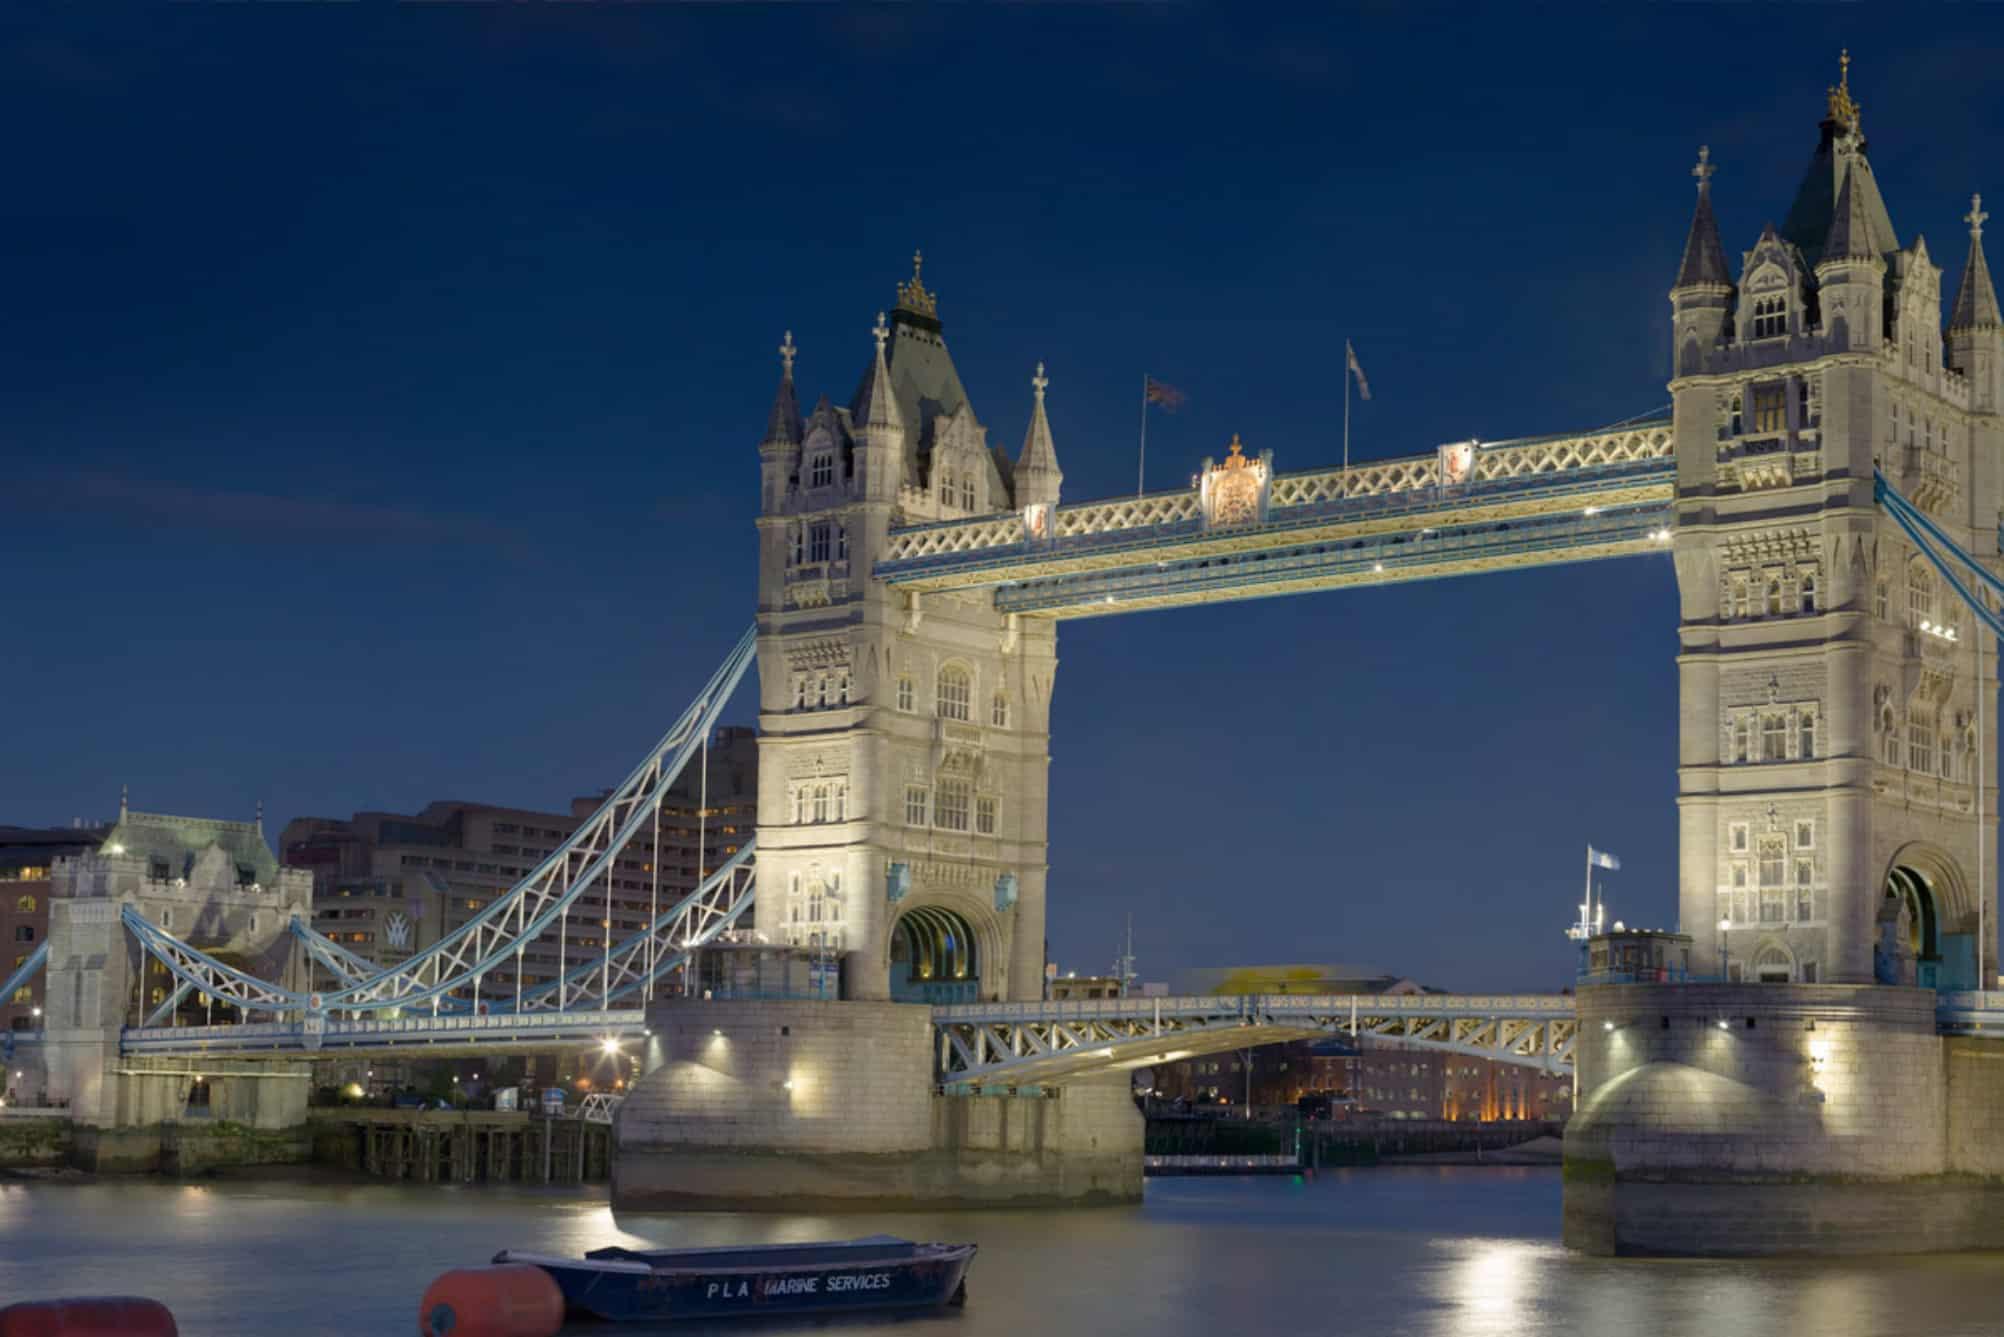 Tower Bridge Venue Hire